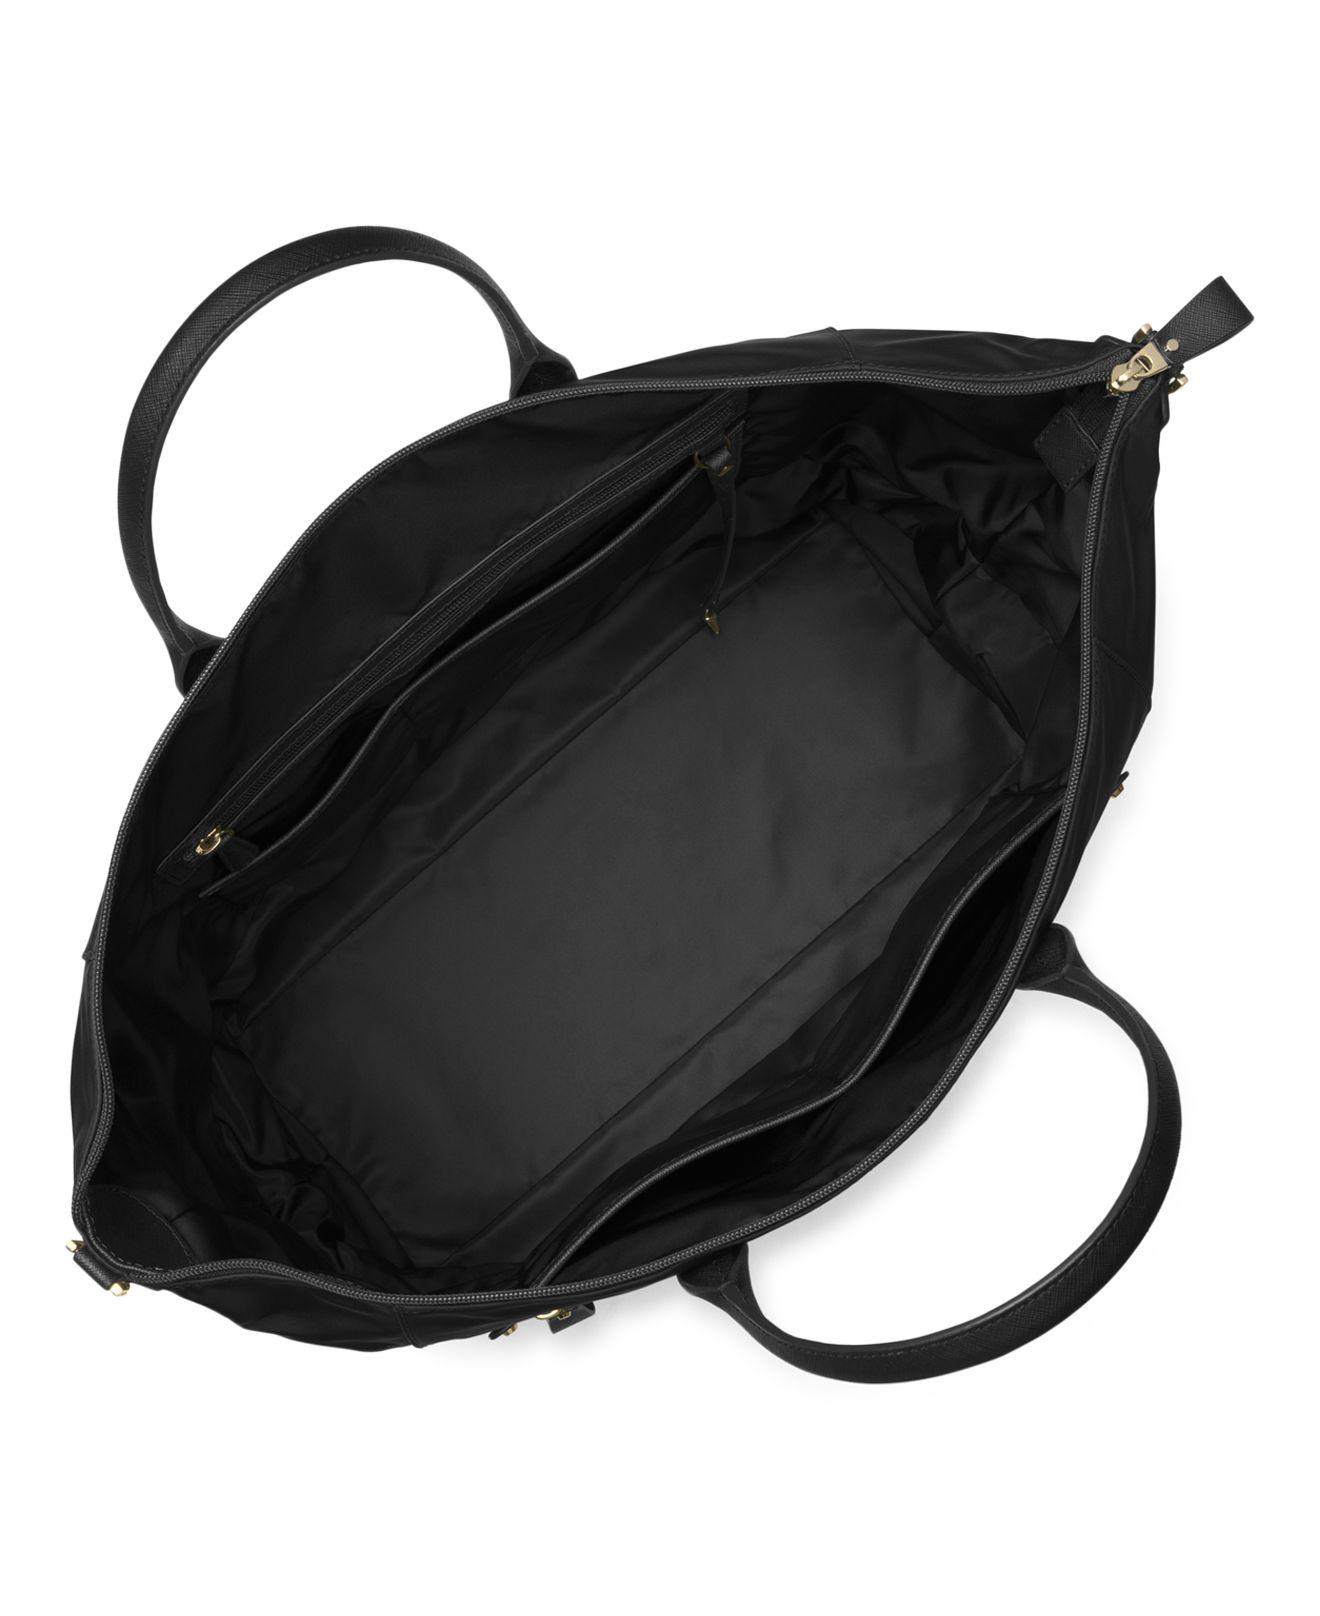 47739fd7505f Lyst - MICHAEL Michael Kors Kelsey Expandable Extra Large Nylon ...